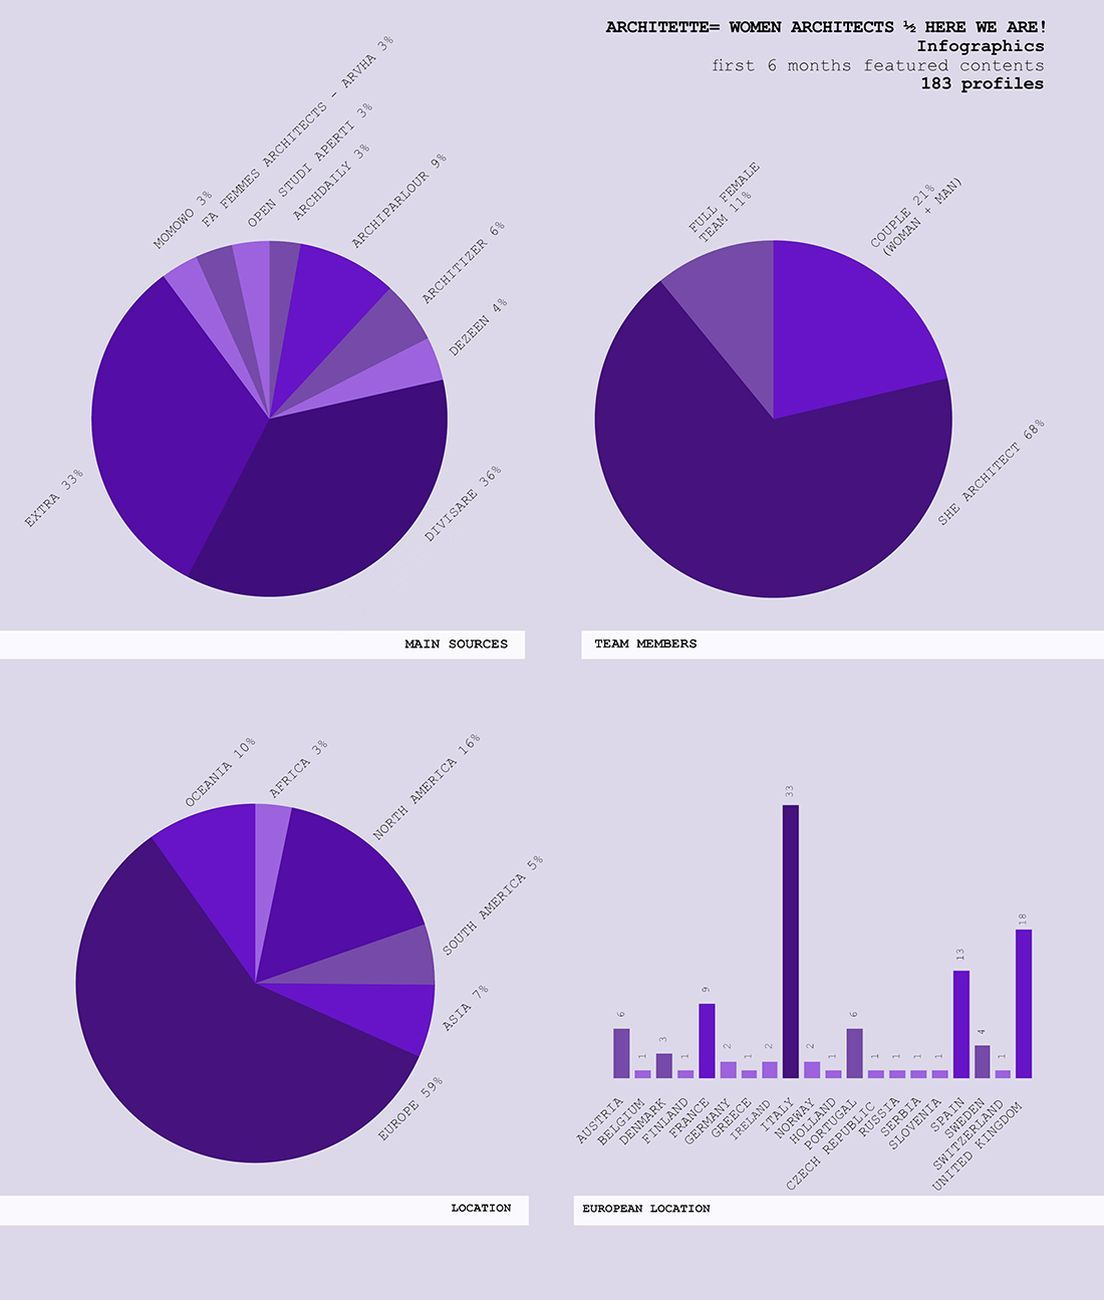 RebelArchitette, Architette = Women Architects 1⁄2 Here We are! Infografica